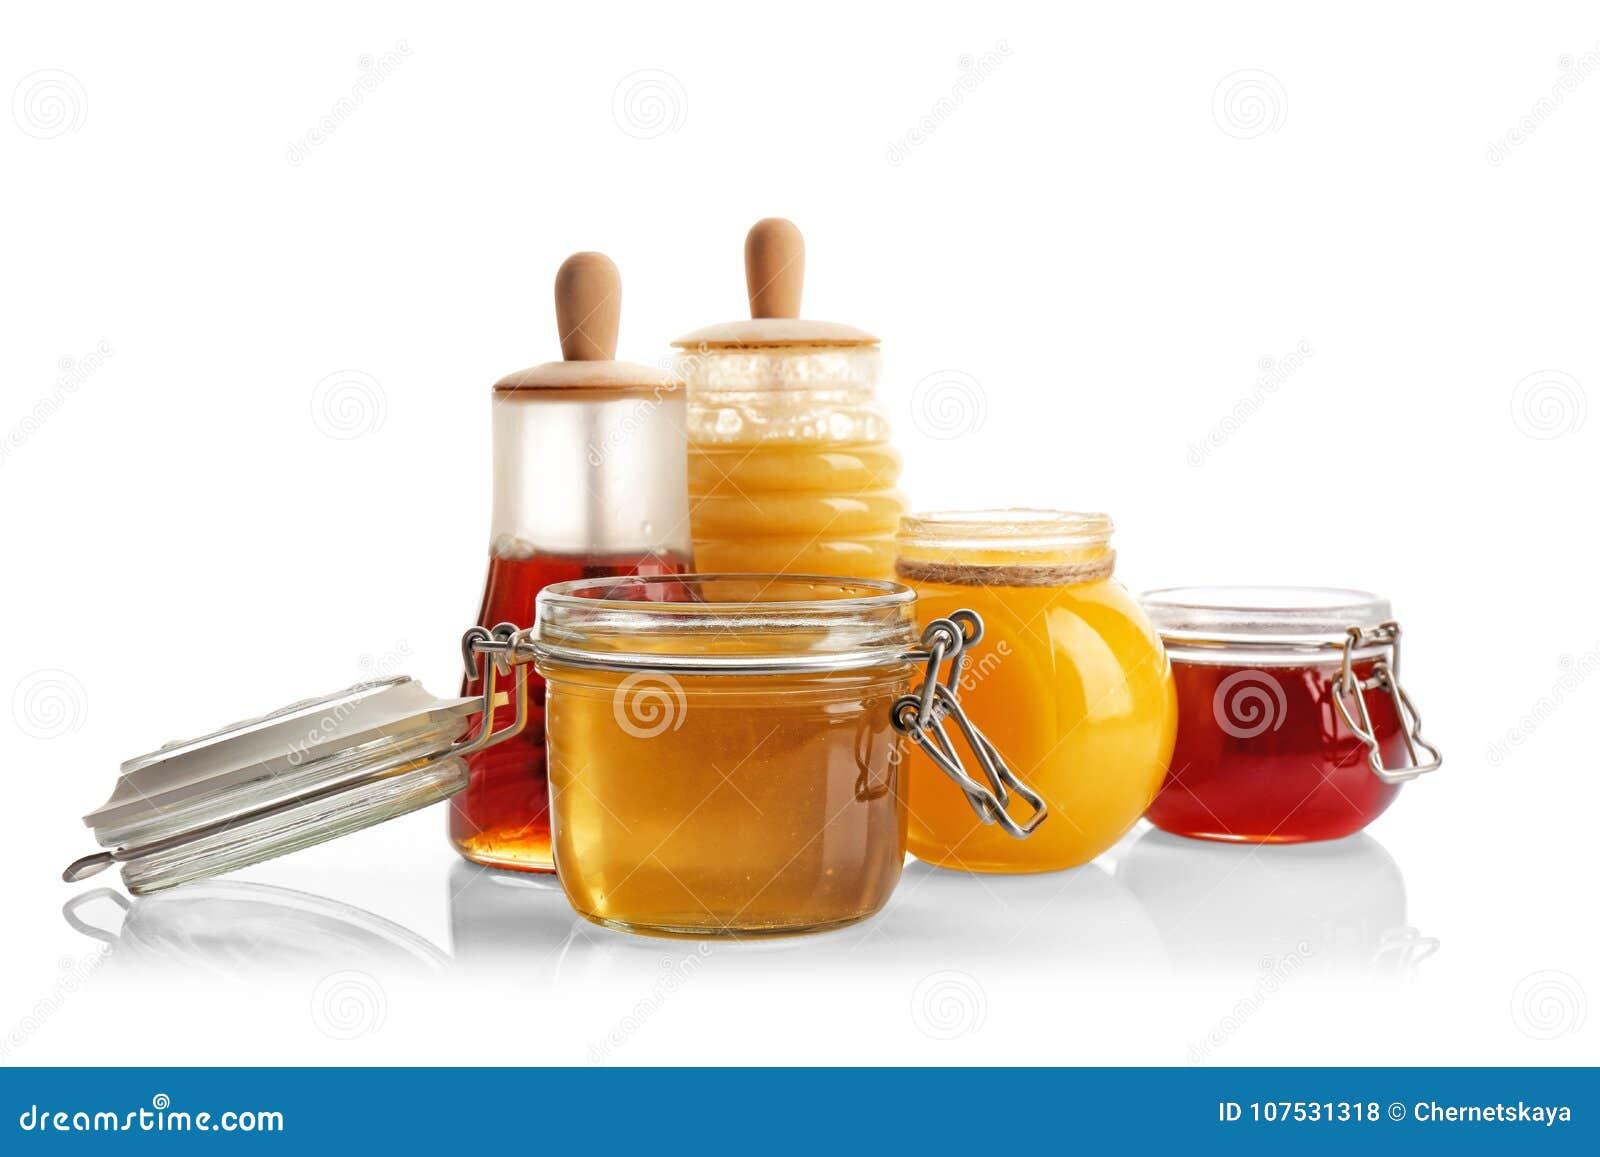 Jars with aromatic honey